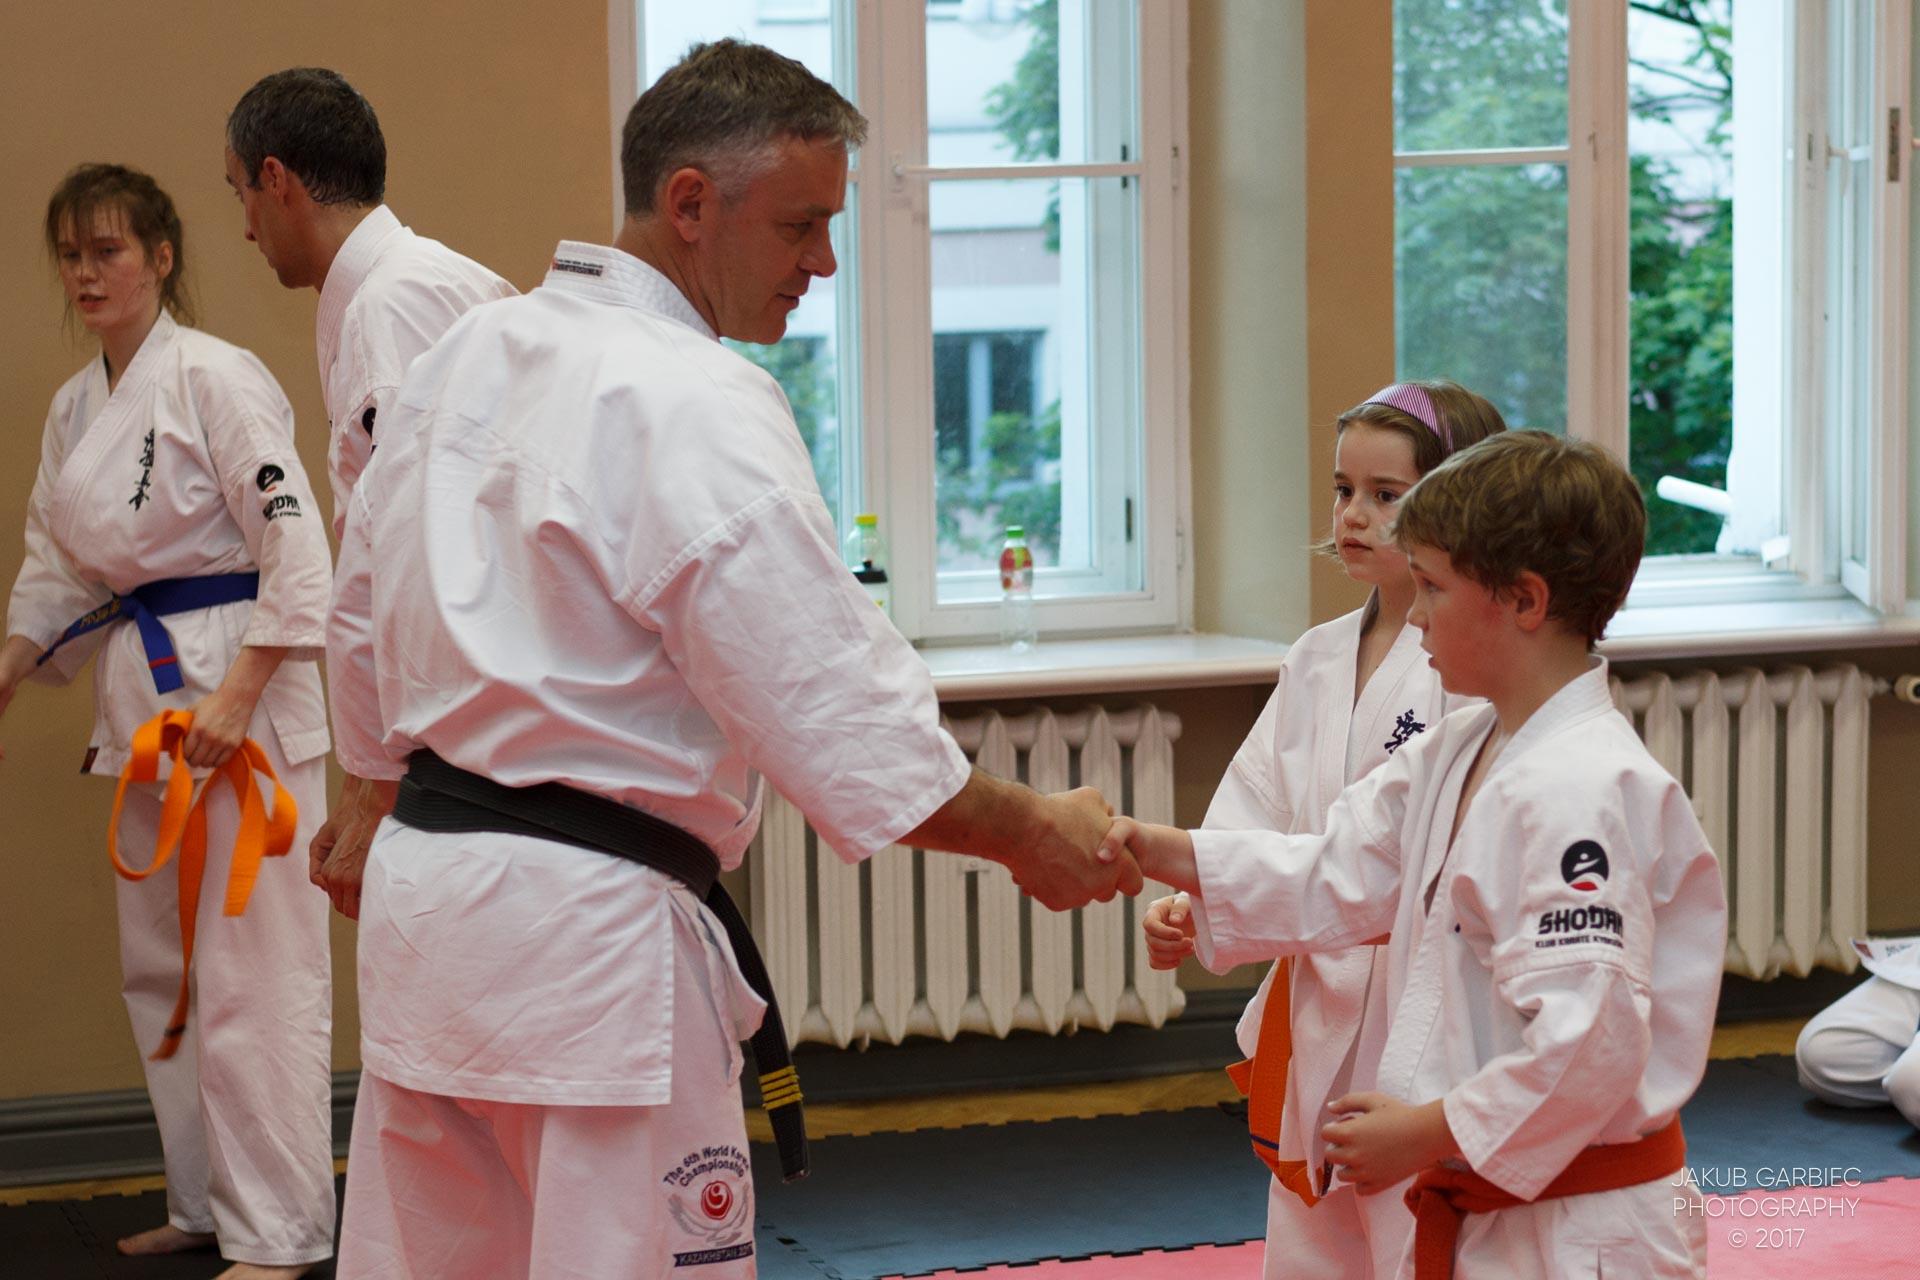 egzamin-karate-mistrz-mariusz-mazur-klub-karate-shodan-2017-06-02-48